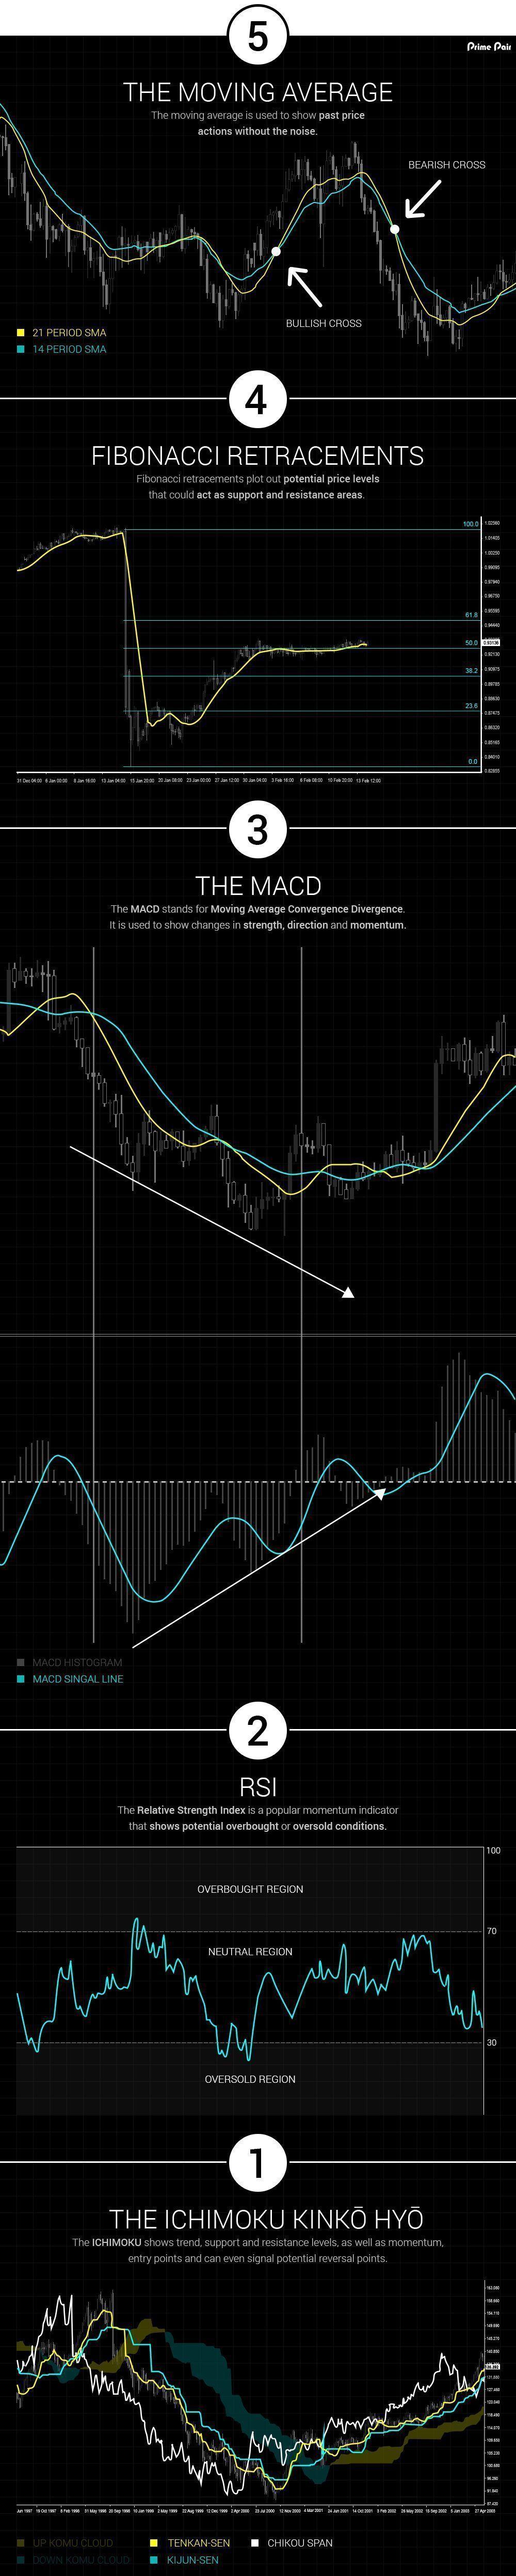 Top 5 Intraday Trading Indicators   Most Accurate Indicators - NTA™️